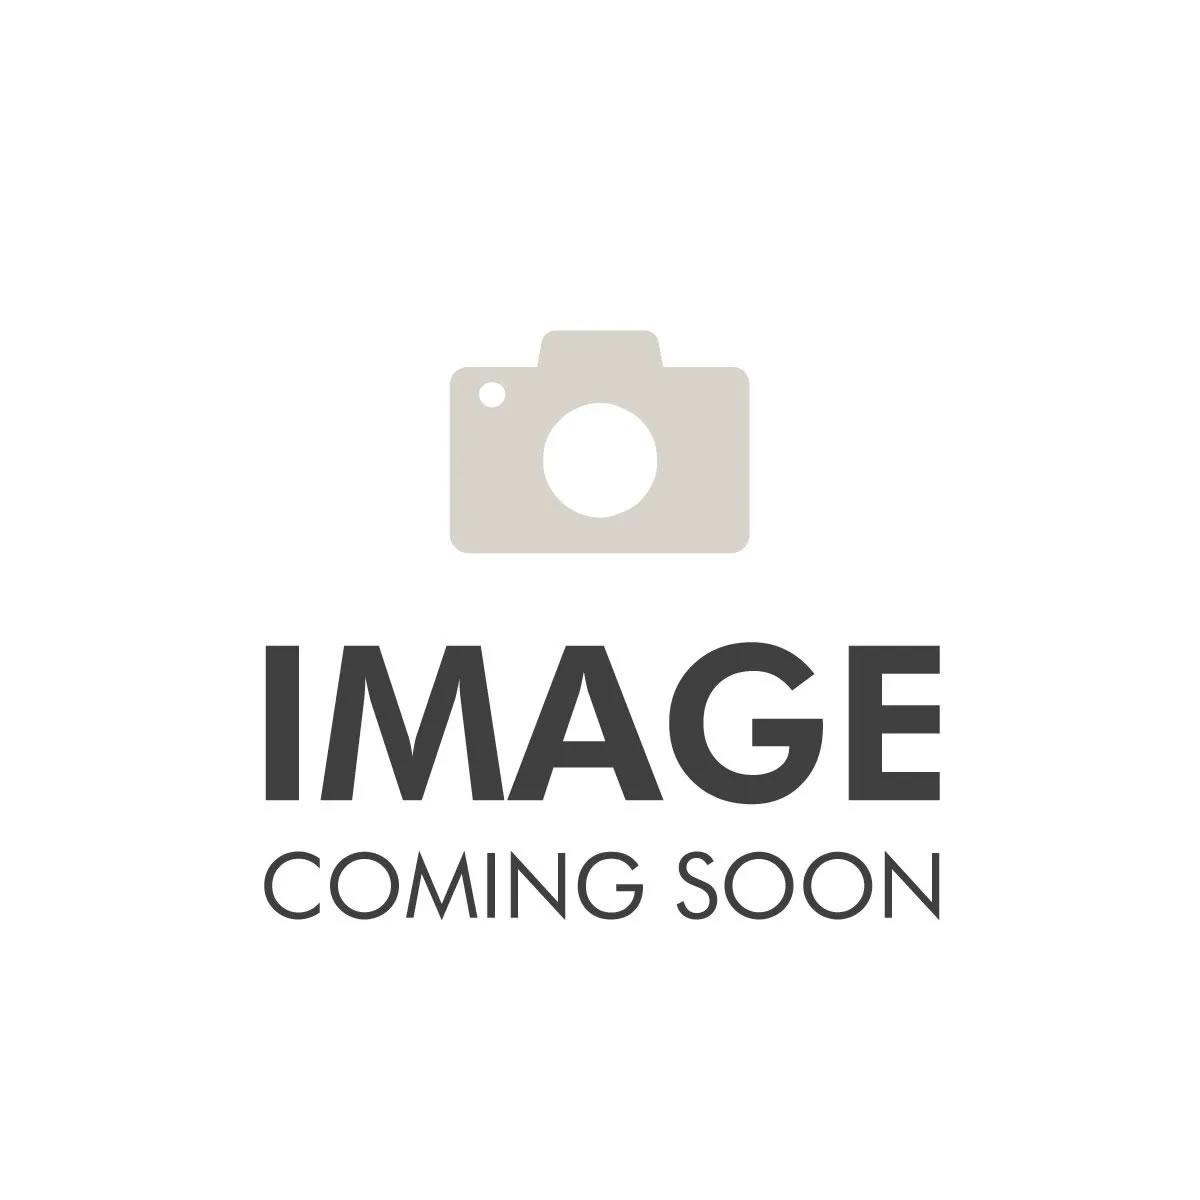 Header Roll Bar Top, Black Diamond; 97-06 Jeep Wrangler TJ